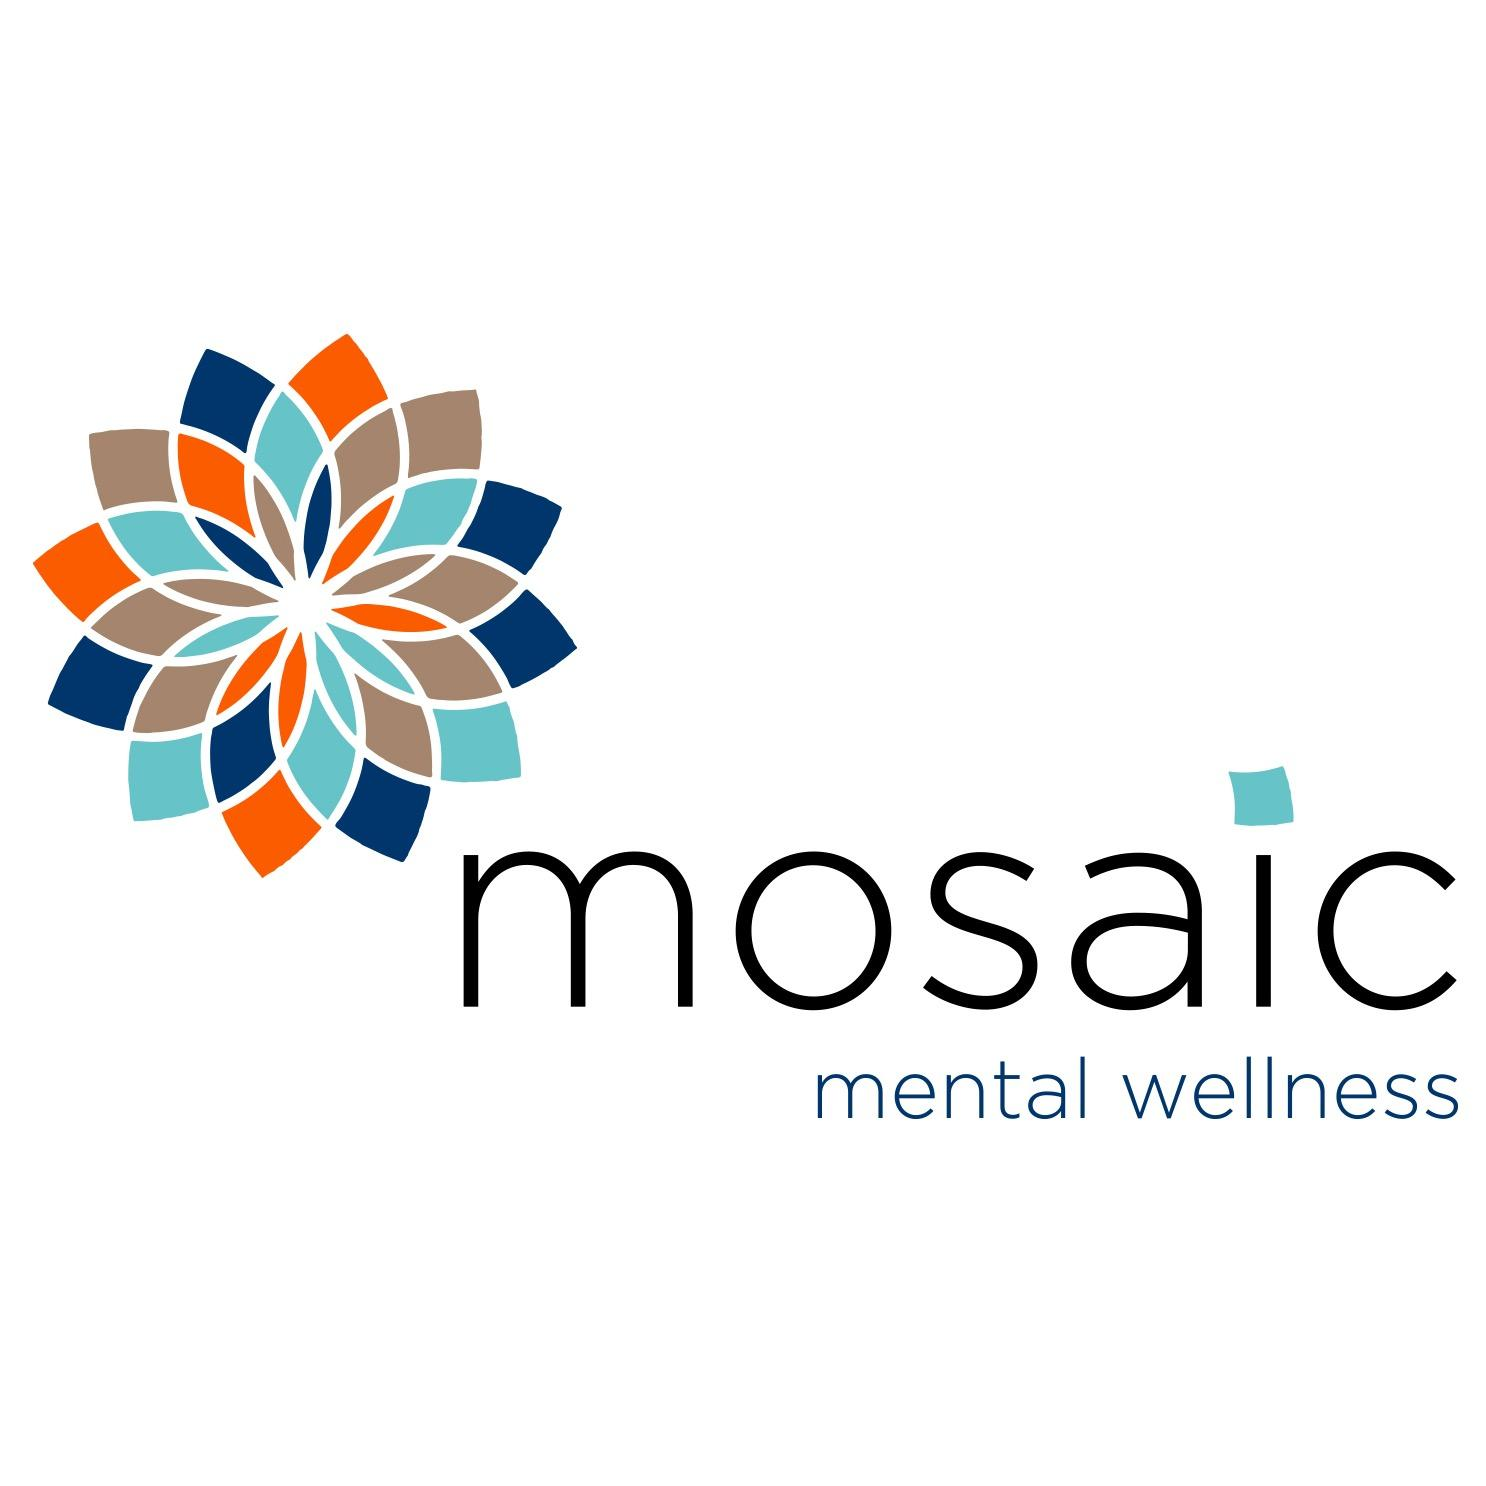 Mosaic Mental Wellness